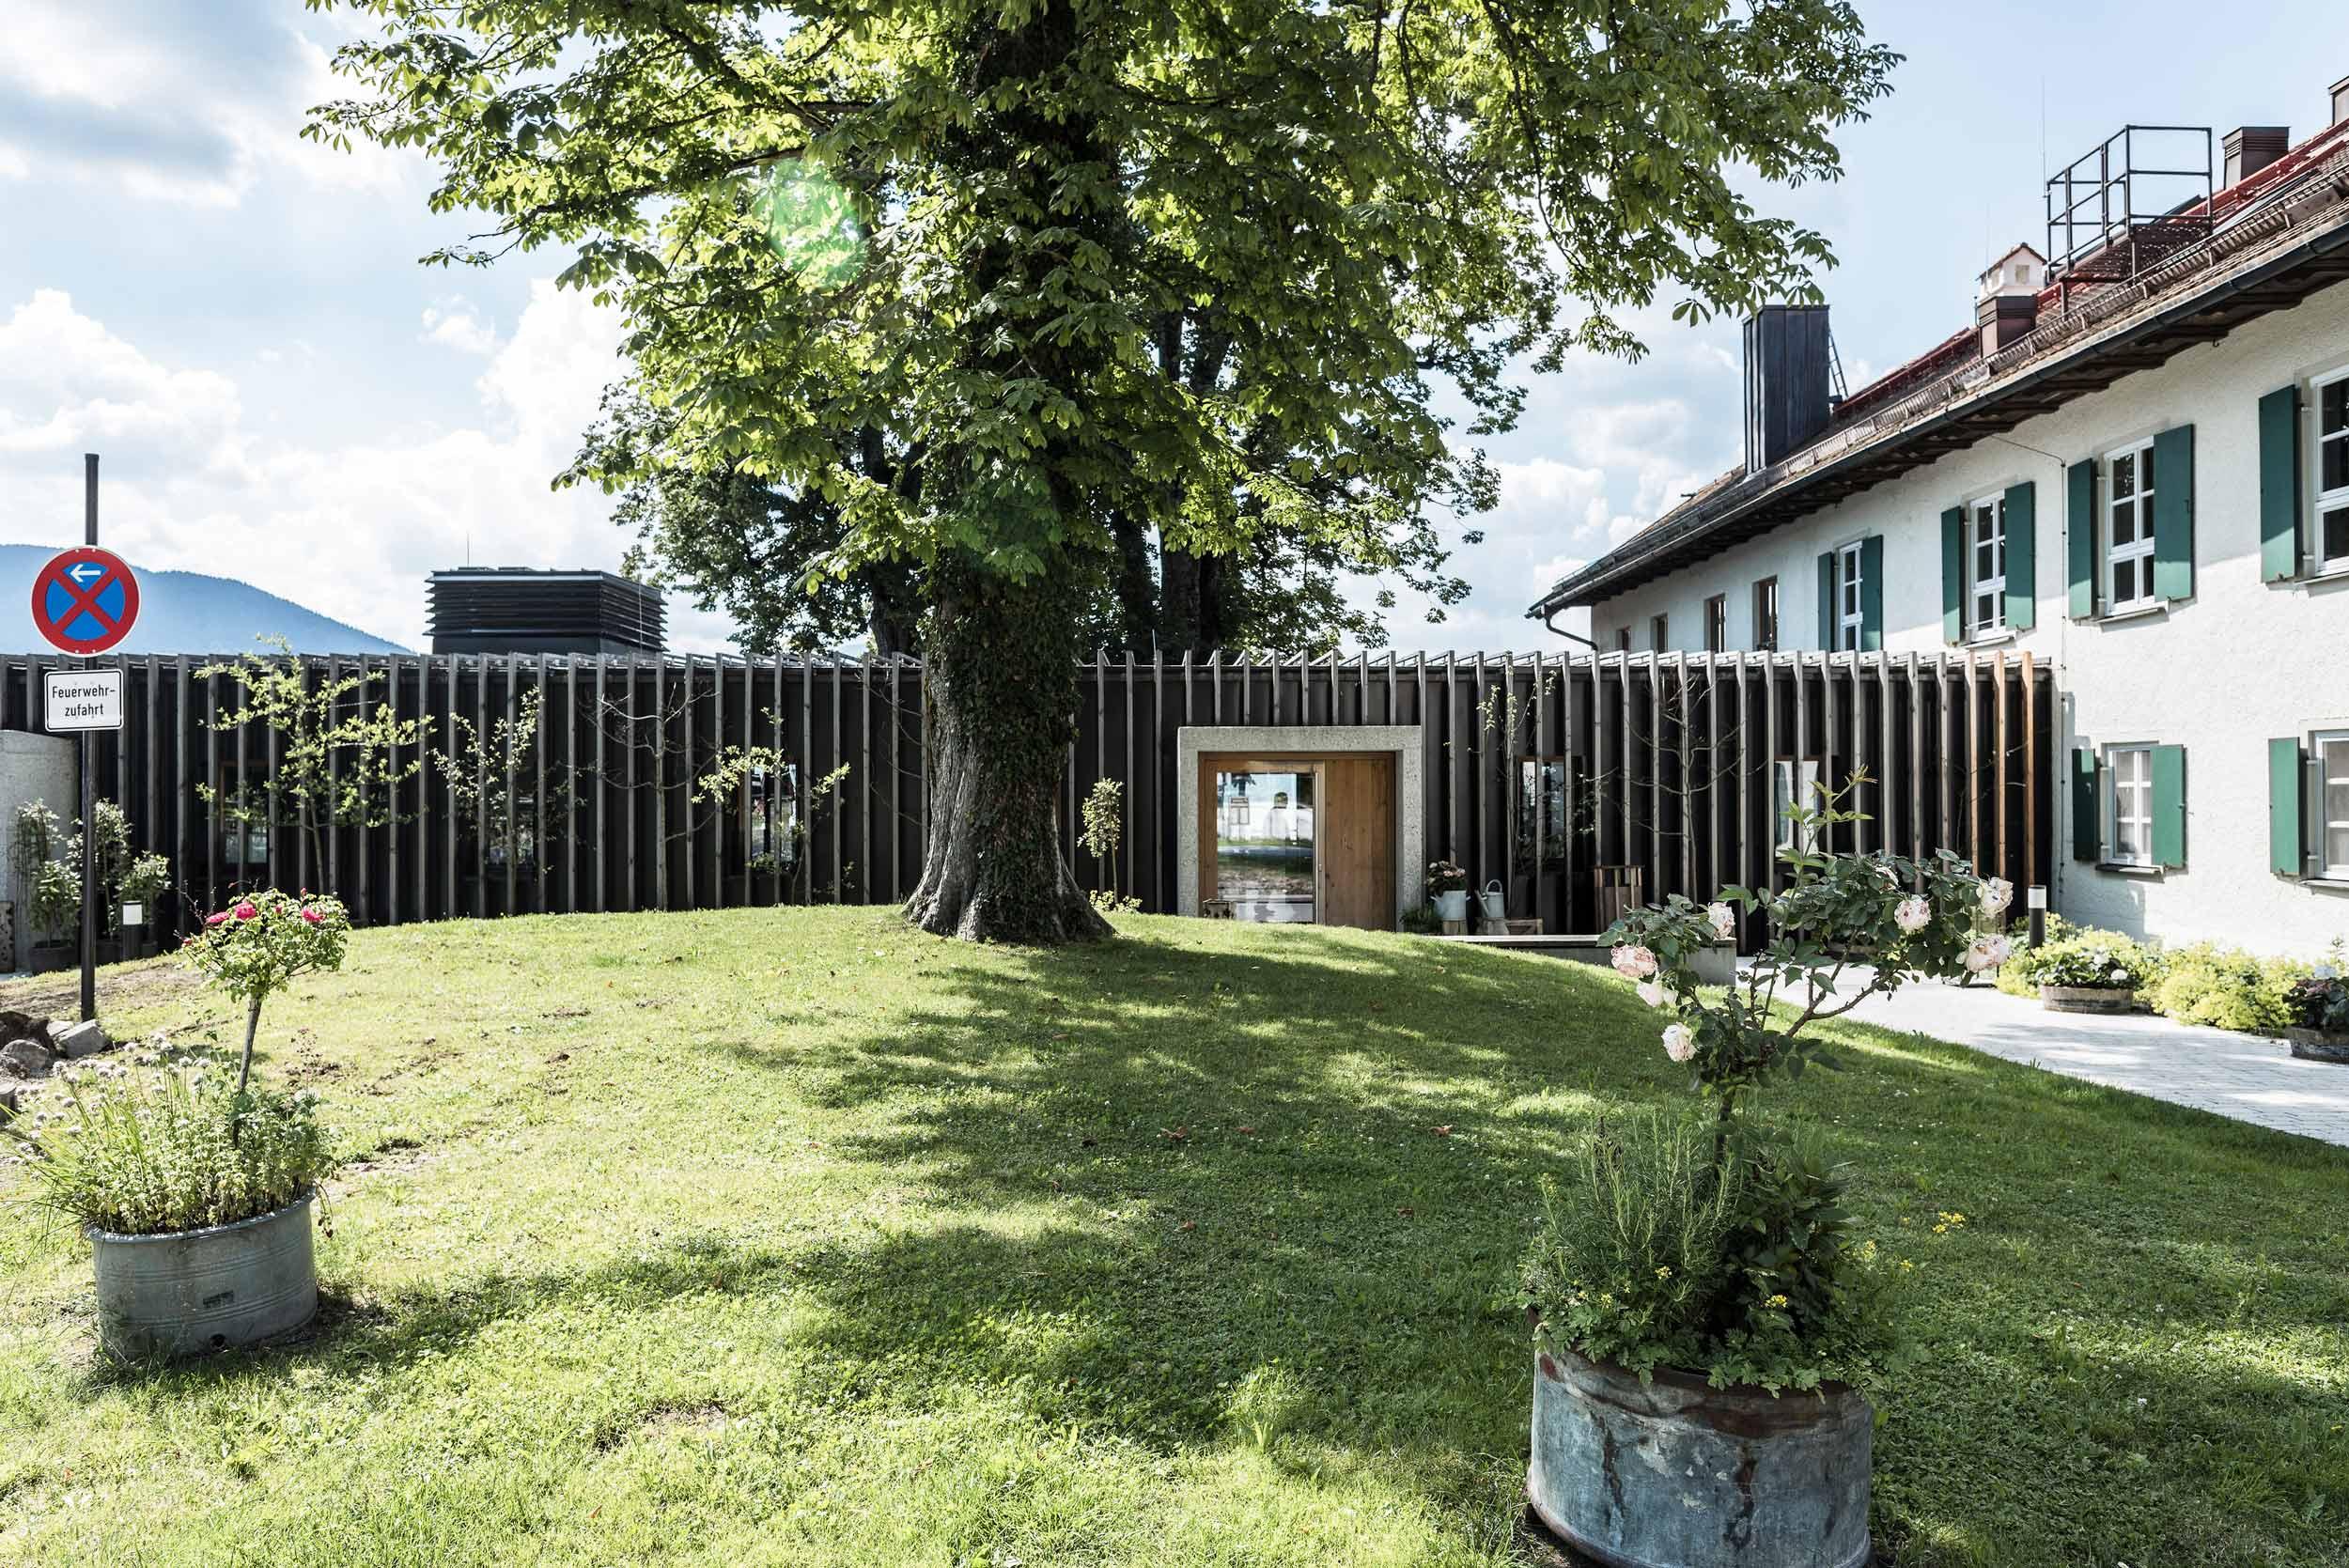 Neubau des Restaurant Käfer am Gut Kaltenbrunn